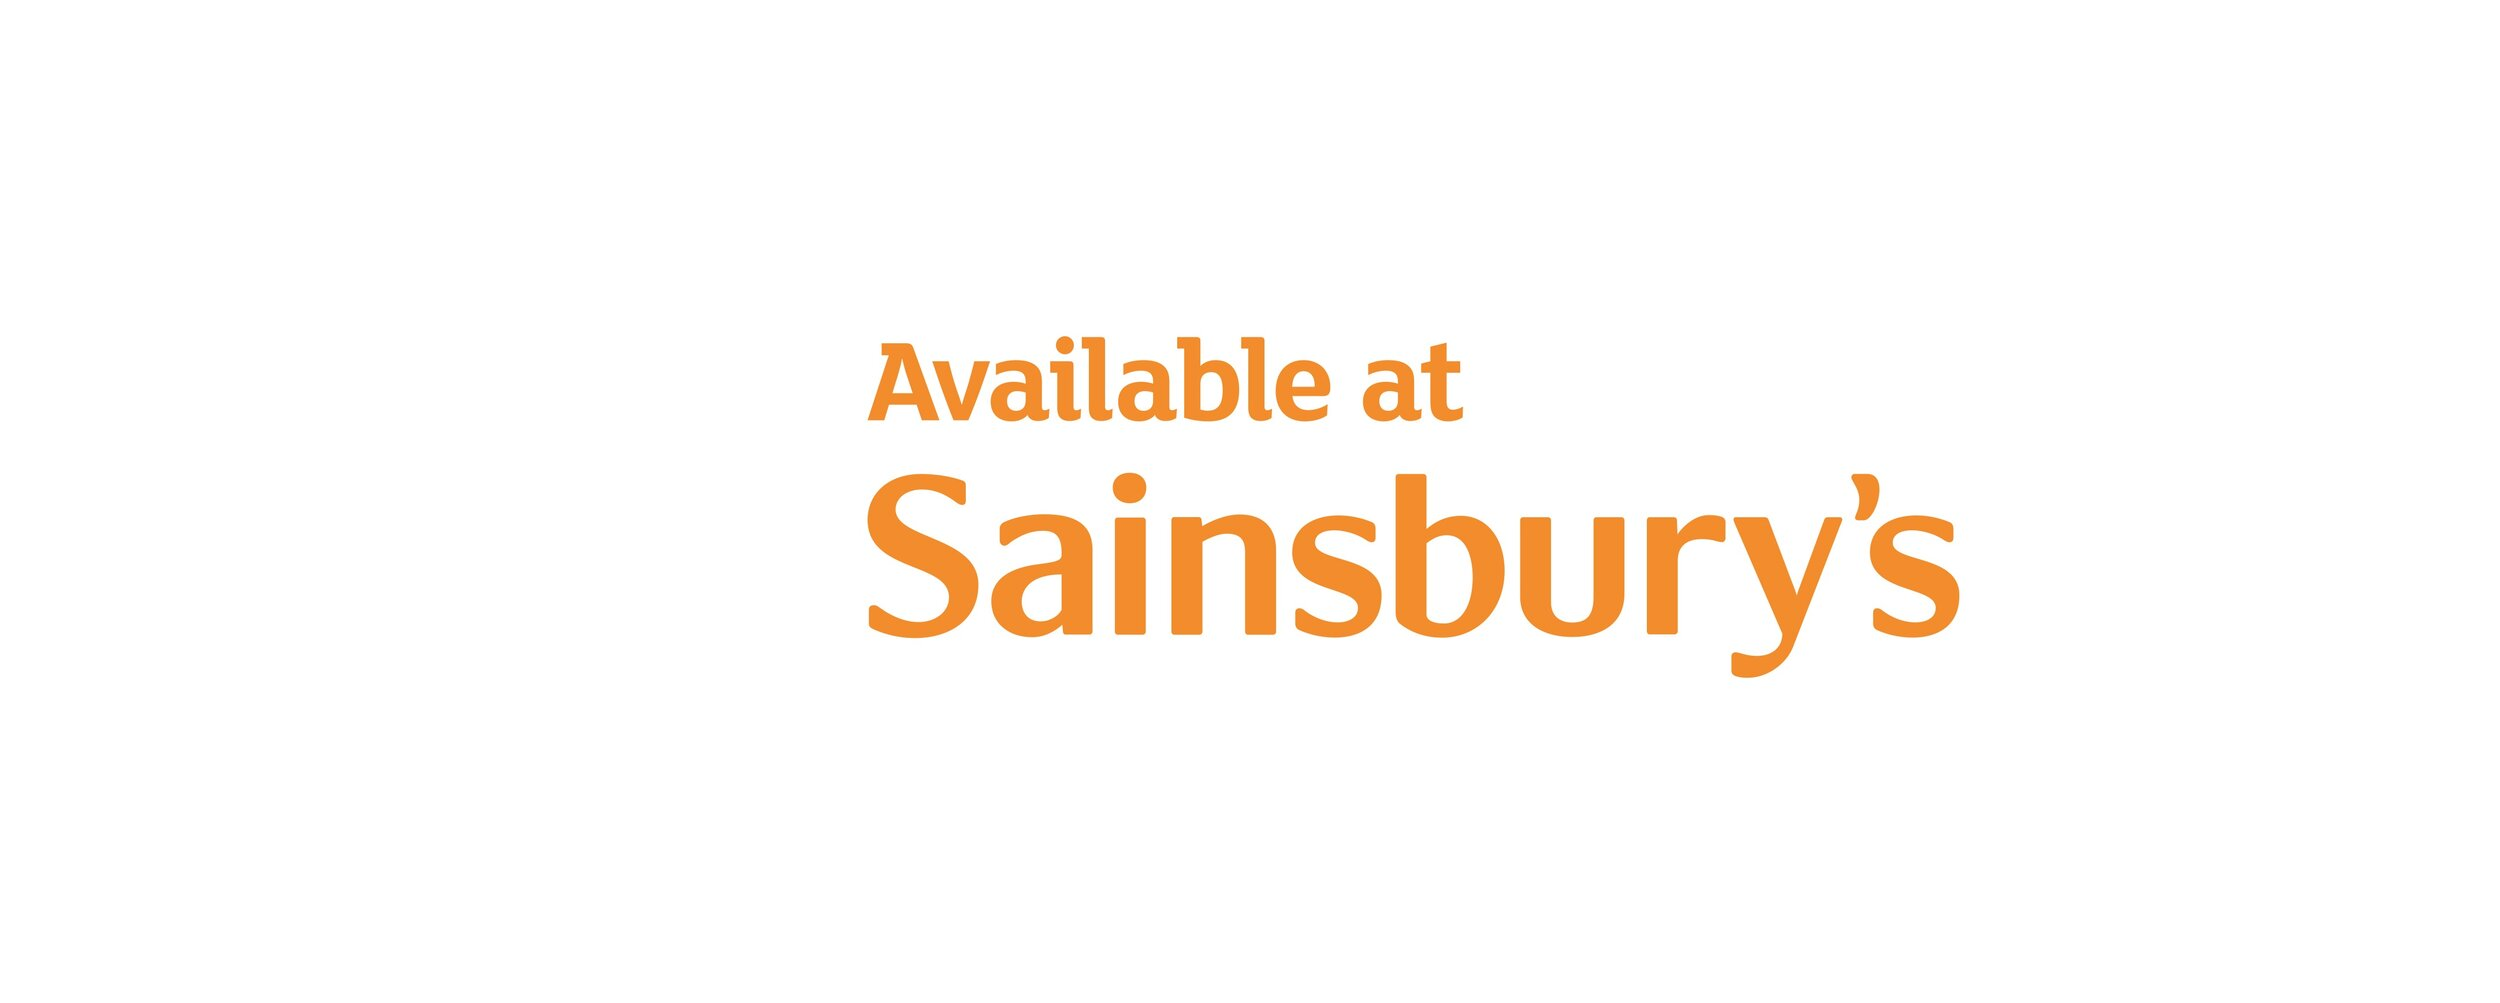 Available_Sainsburys_Stacked_Orange_CMYK (1)edit.jpg